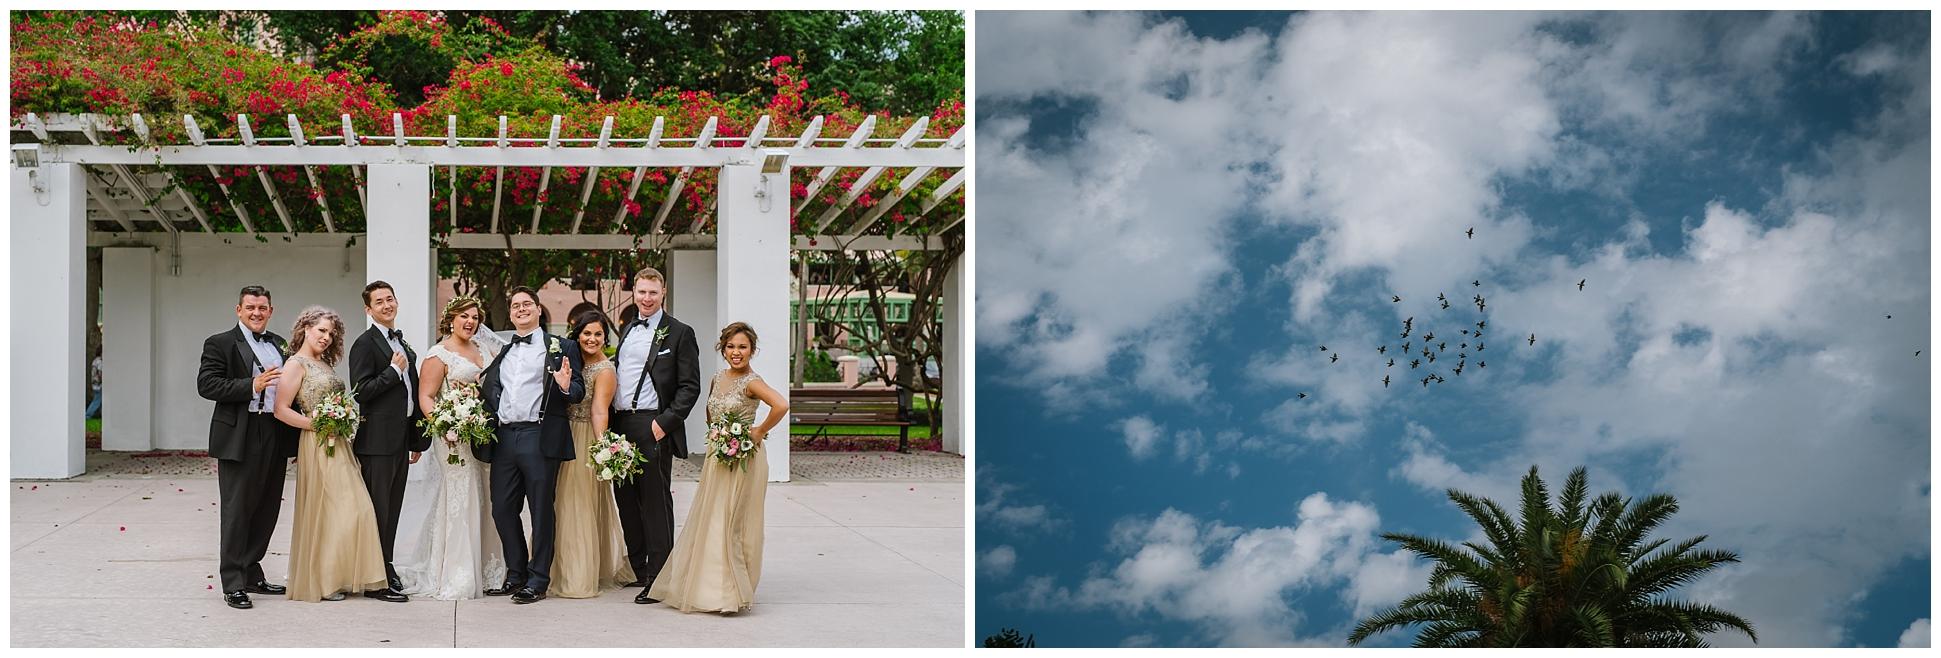 st-pete-wedding-photographer-italian-romance-theme-rustic-flower-crown_0415.jpg